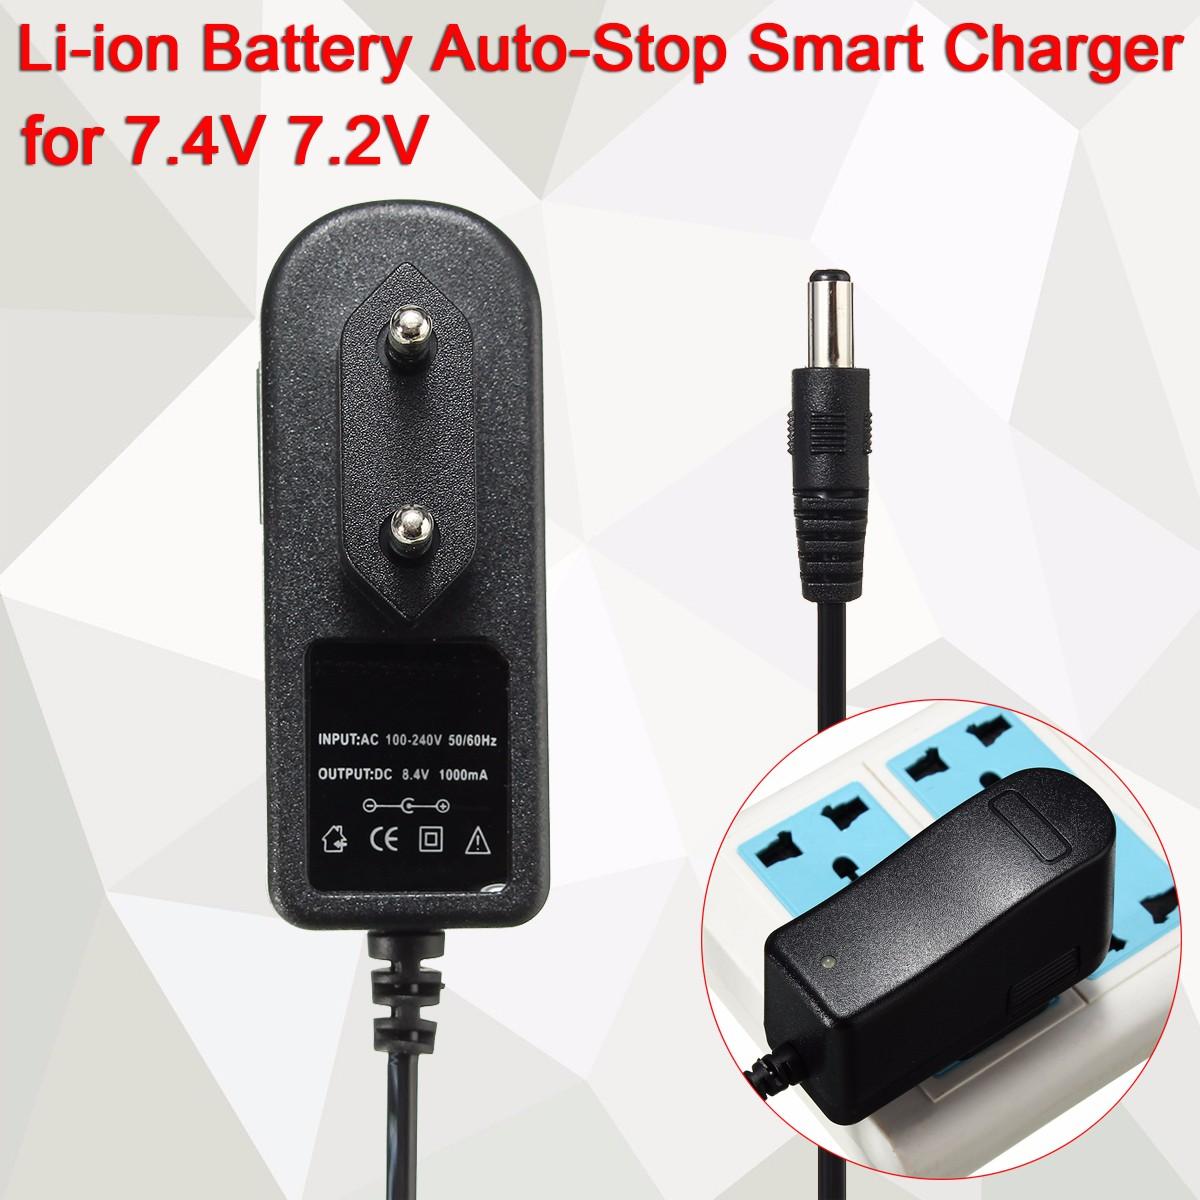 Smart Charger 8.4V 1A for 7.4V 7.2V Li-ion Li-po Battery Auto-Stop